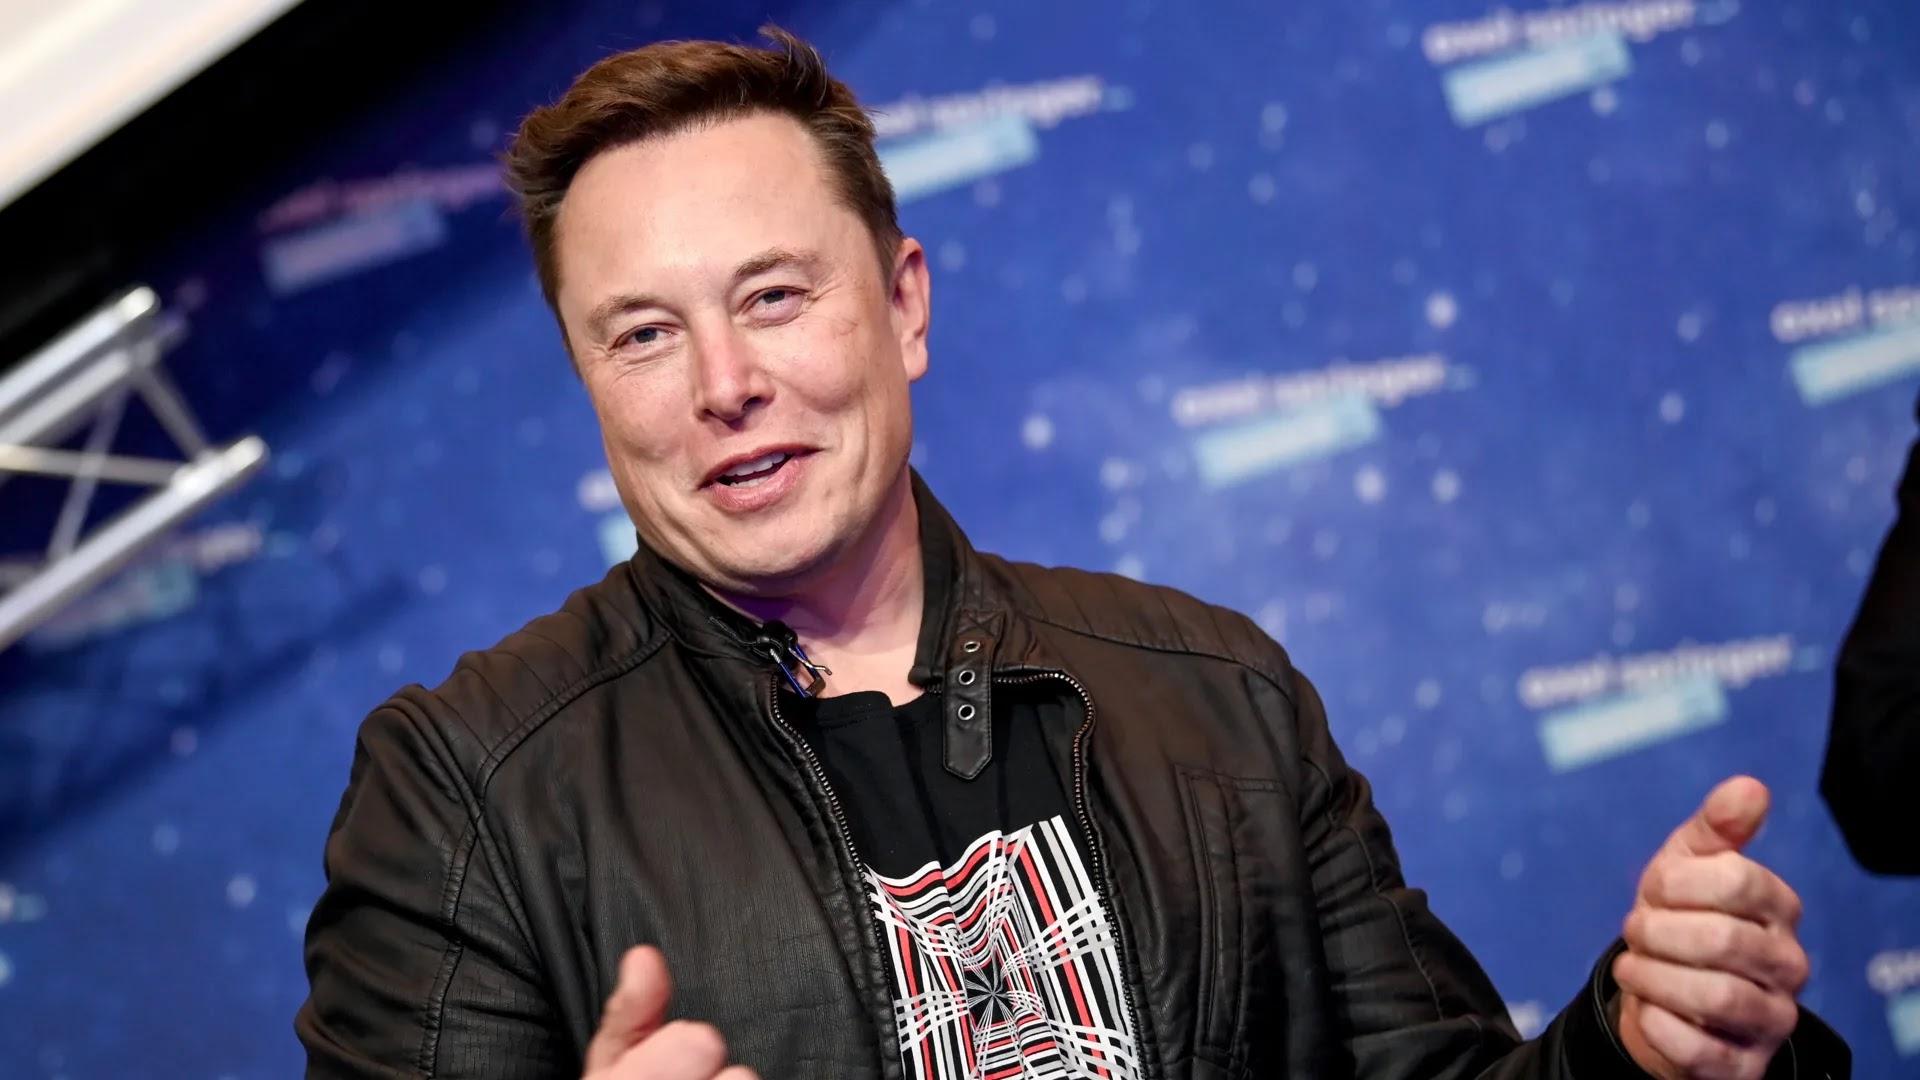 Elon Musk Premio 100 millones